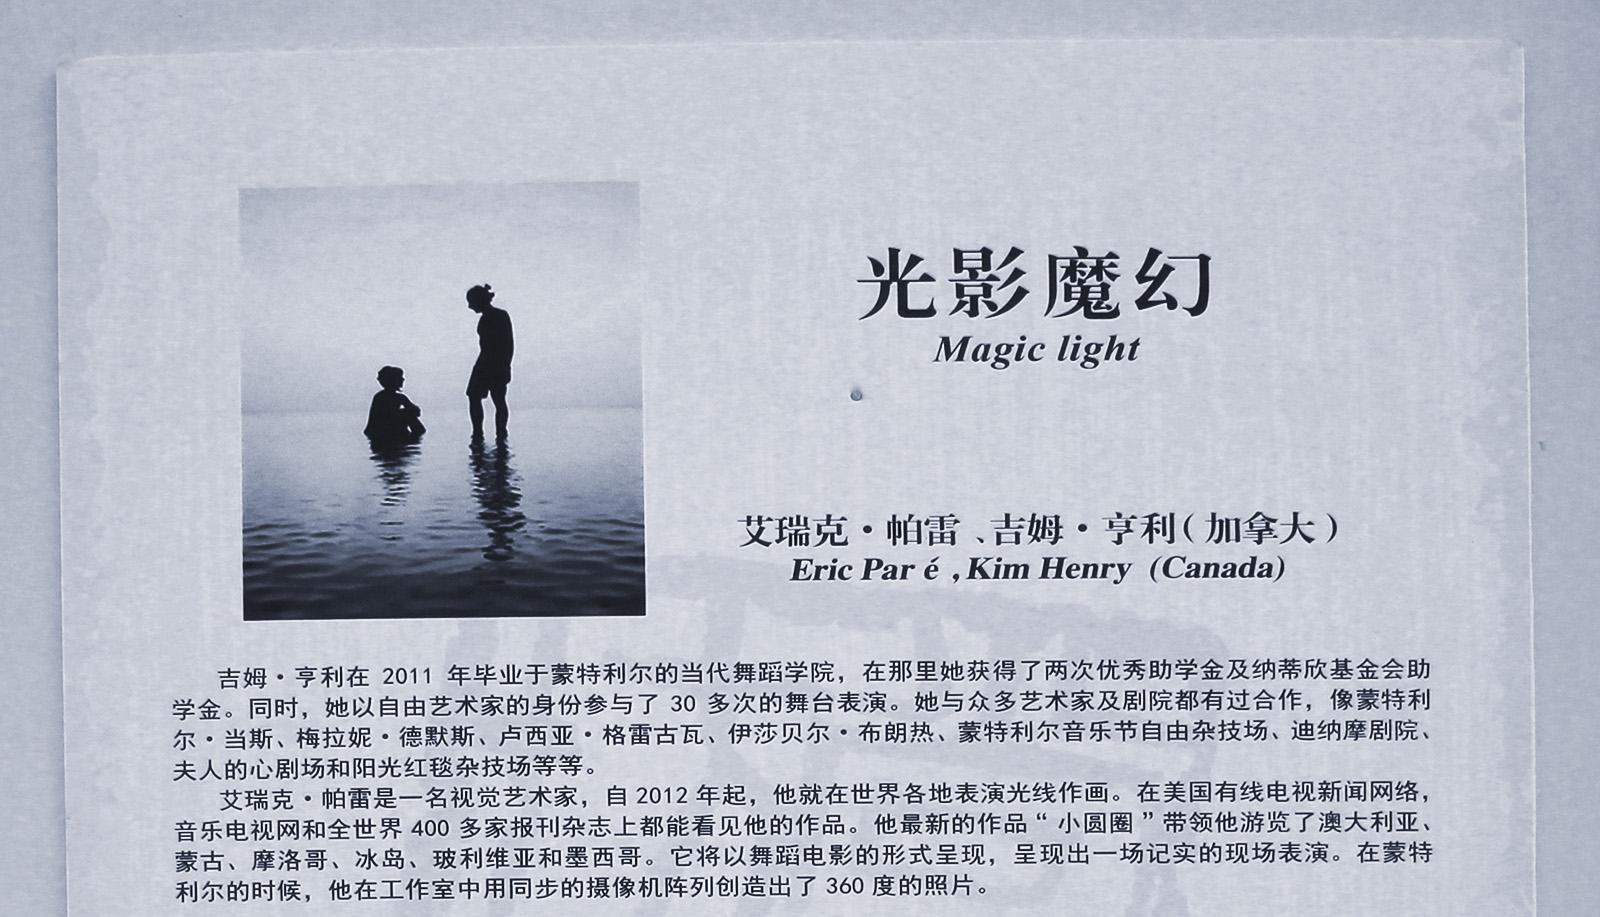 light-painting-exhibition-china-eric-pare-kim-henry-huangshan-international-photography-festival-11th-yixian-1-jpg-pox6.jpg